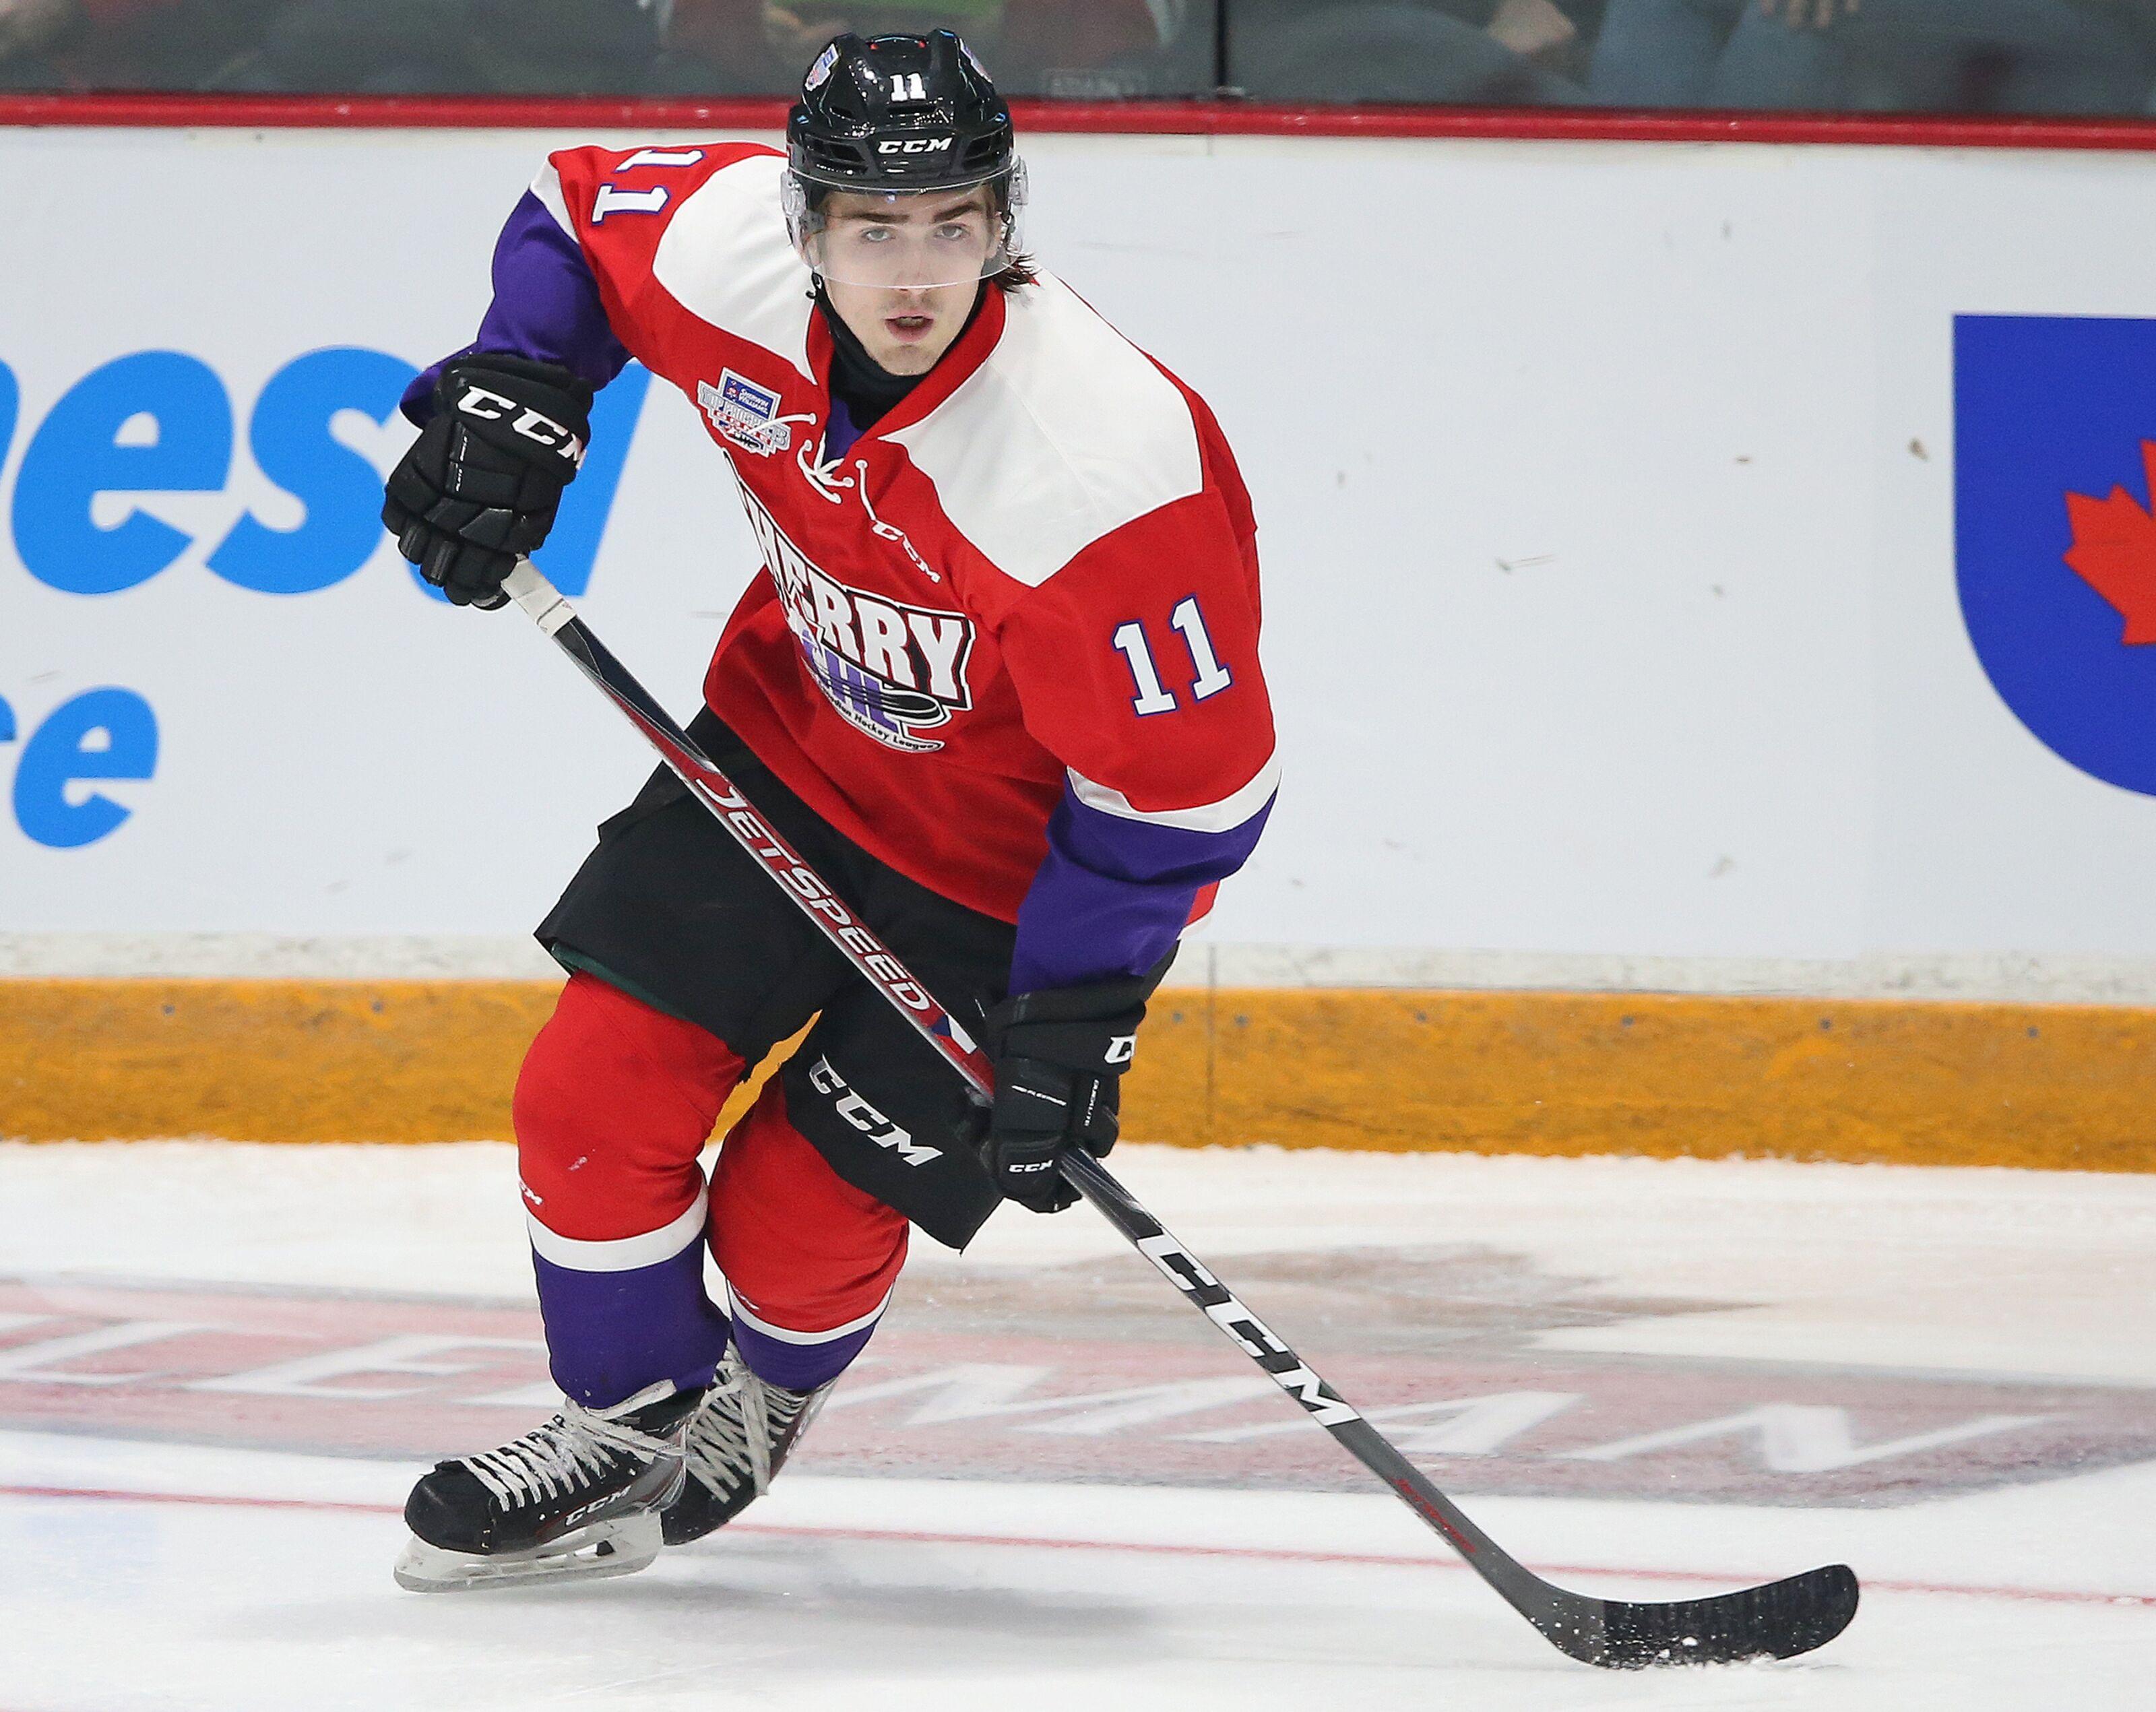 cf97c2e8c 2018 NHL draft prospect profile #3: Filip Zadina